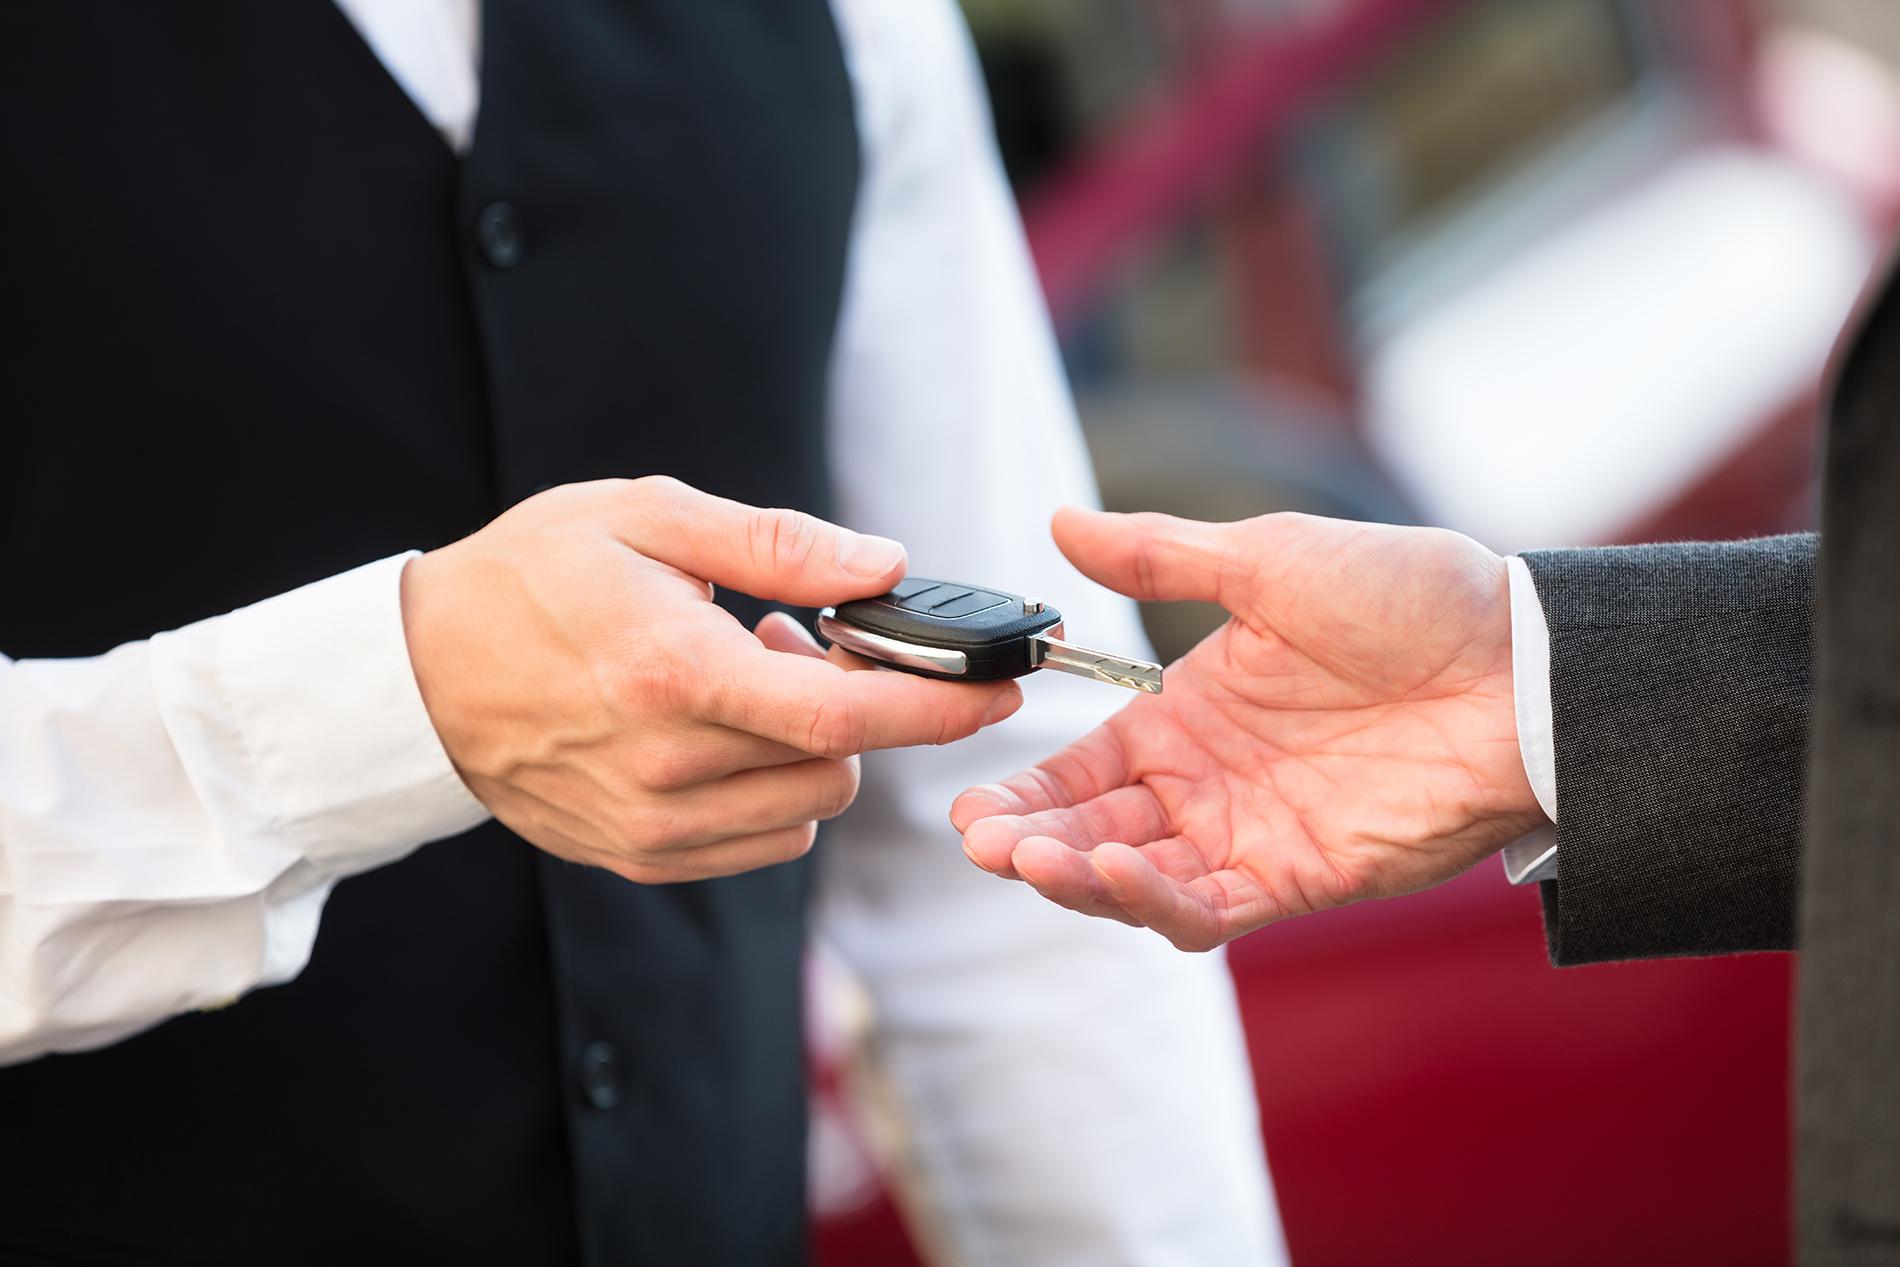 person handing car keys over